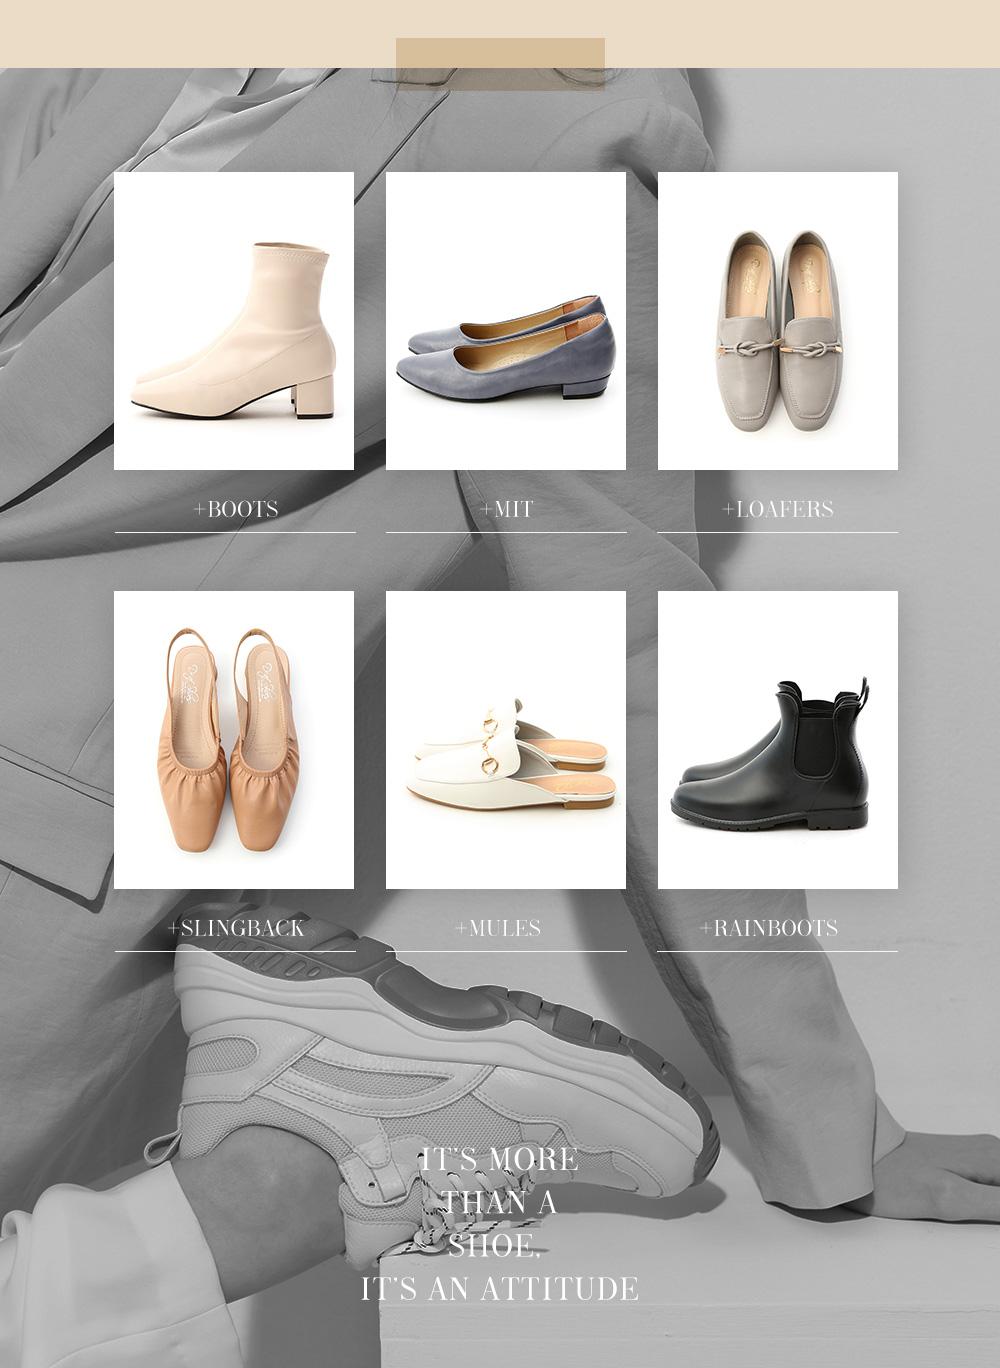 D+AF人氣熱銷鞋款 豆豆鞋 樂福鞋 牛津鞋 帆布鞋 高跟鞋 穆勒鞋